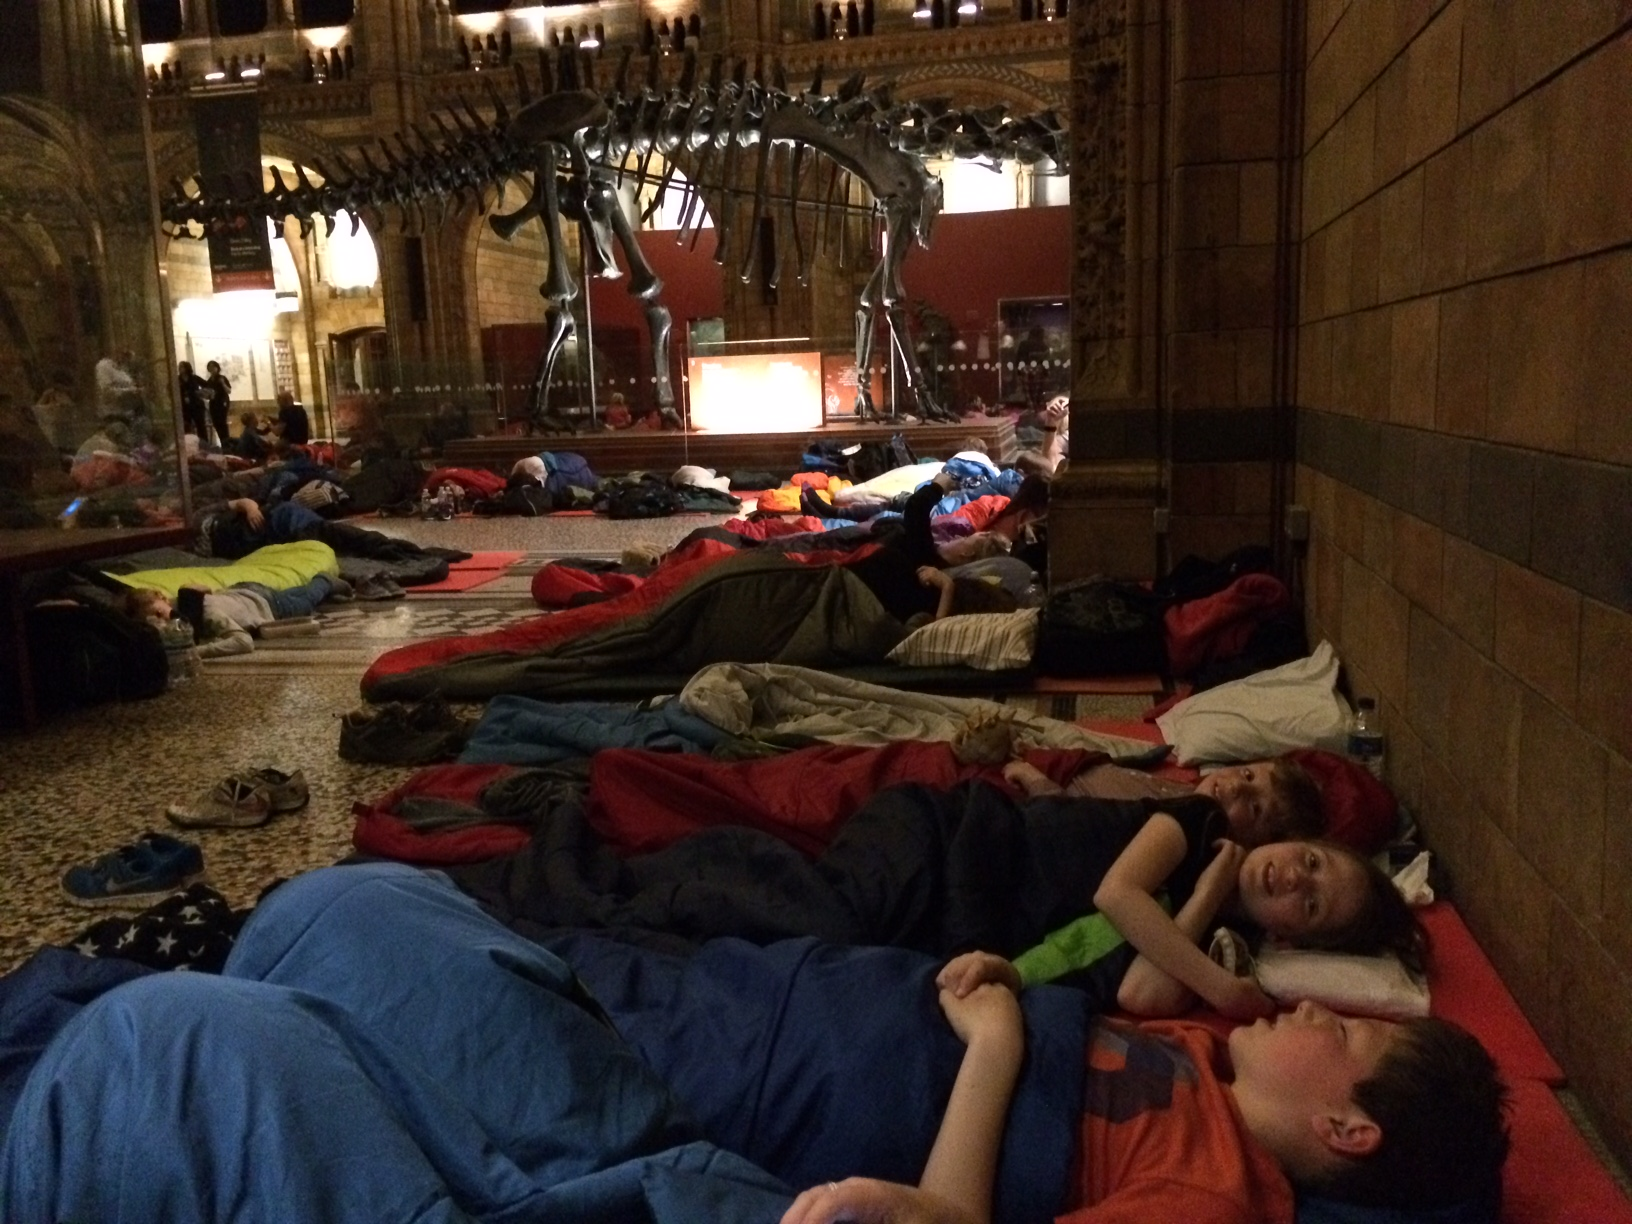 Dinosnores sleepover at NHM